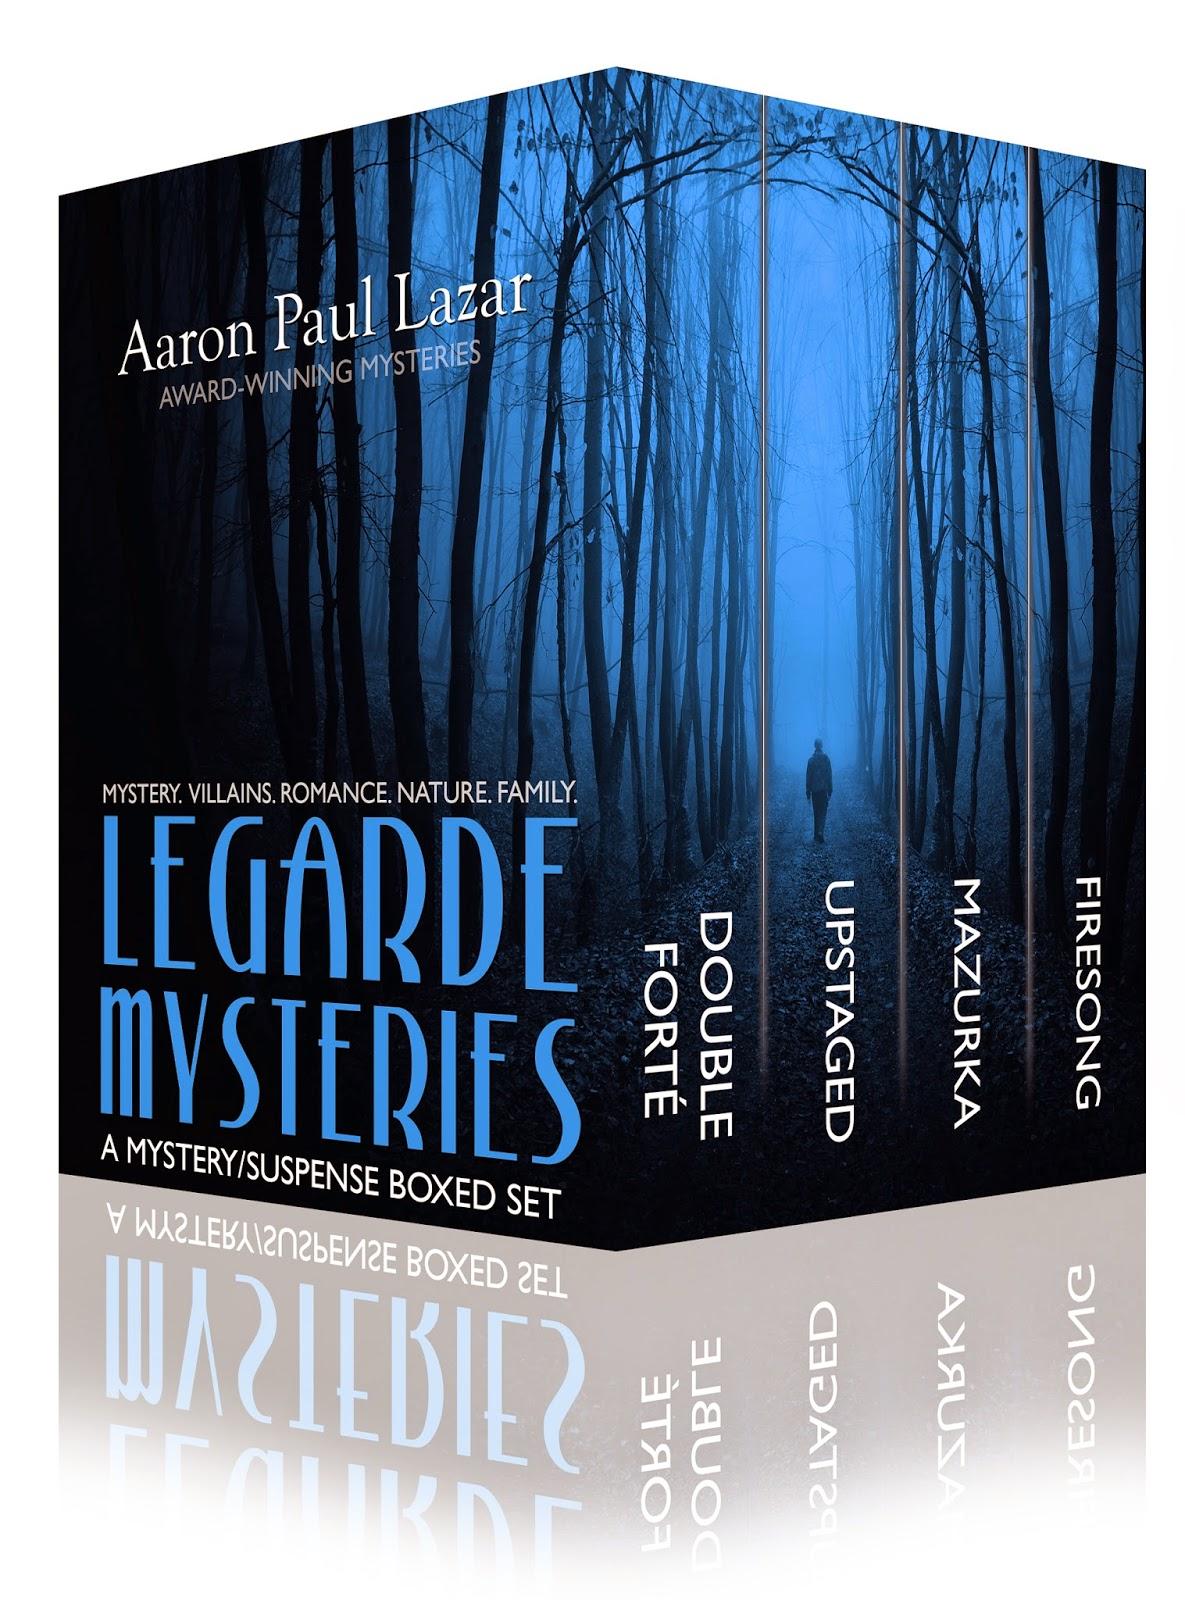 http://www.amazon.com/LeGarde-Mysteries-Omnibus-Aaron-Lazar-ebook/dp/B00K5HGIWC/ref=sr_1_1?ie=UTF8&qid=1406294919&sr=8-1&keywords=legarde+mysteries+omnibus